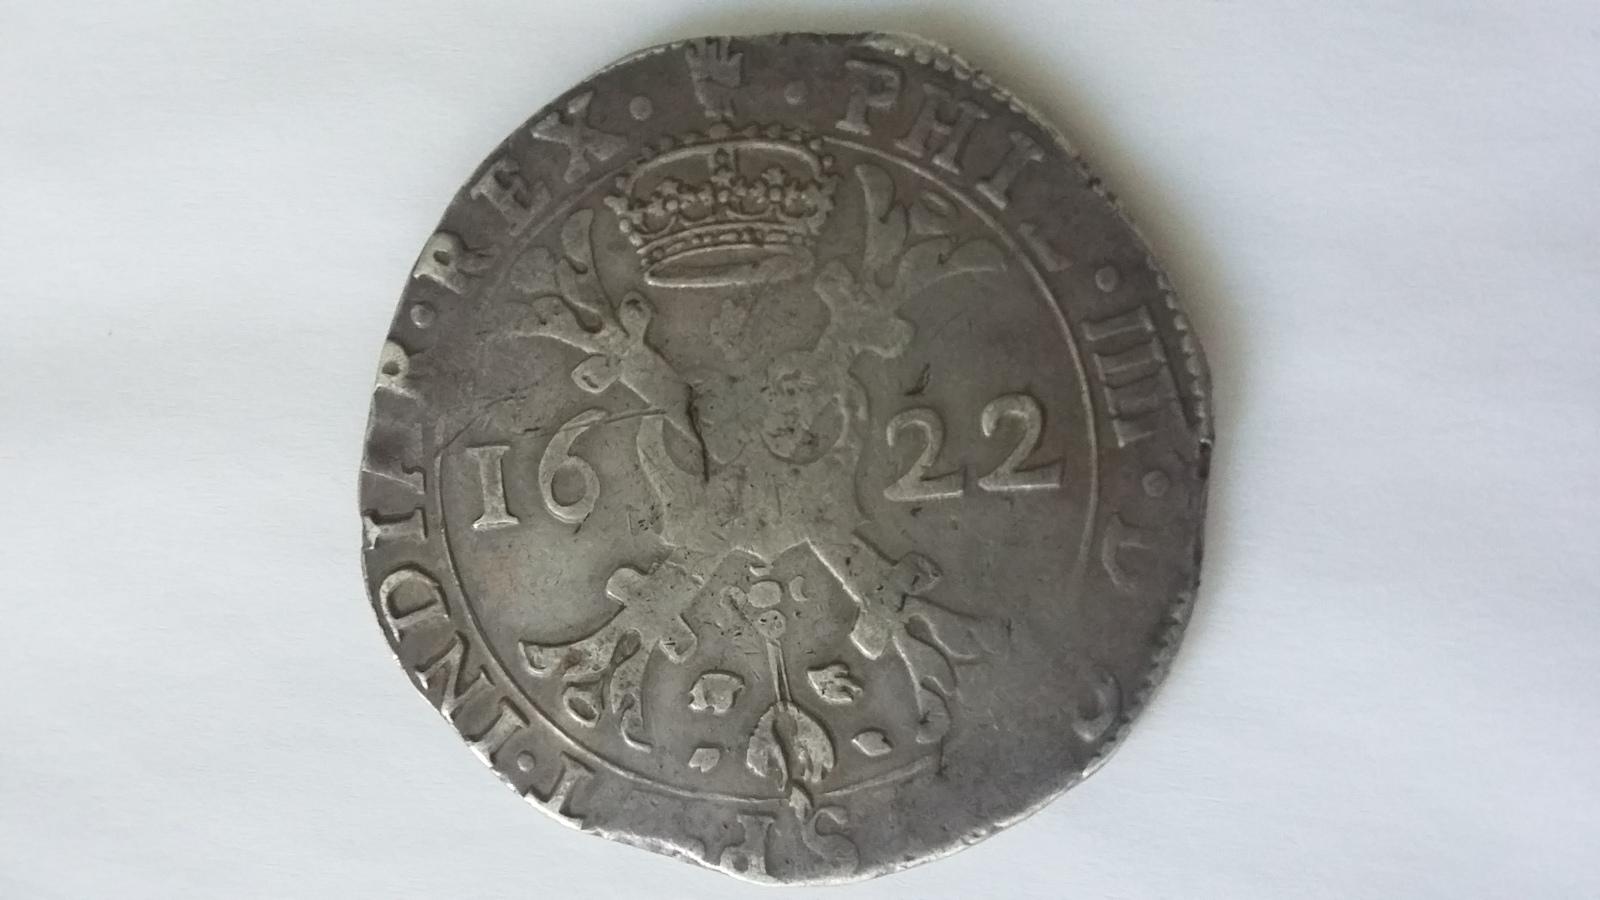 1 patagón 1622. Felipe IV. Amberes 5u3c6q